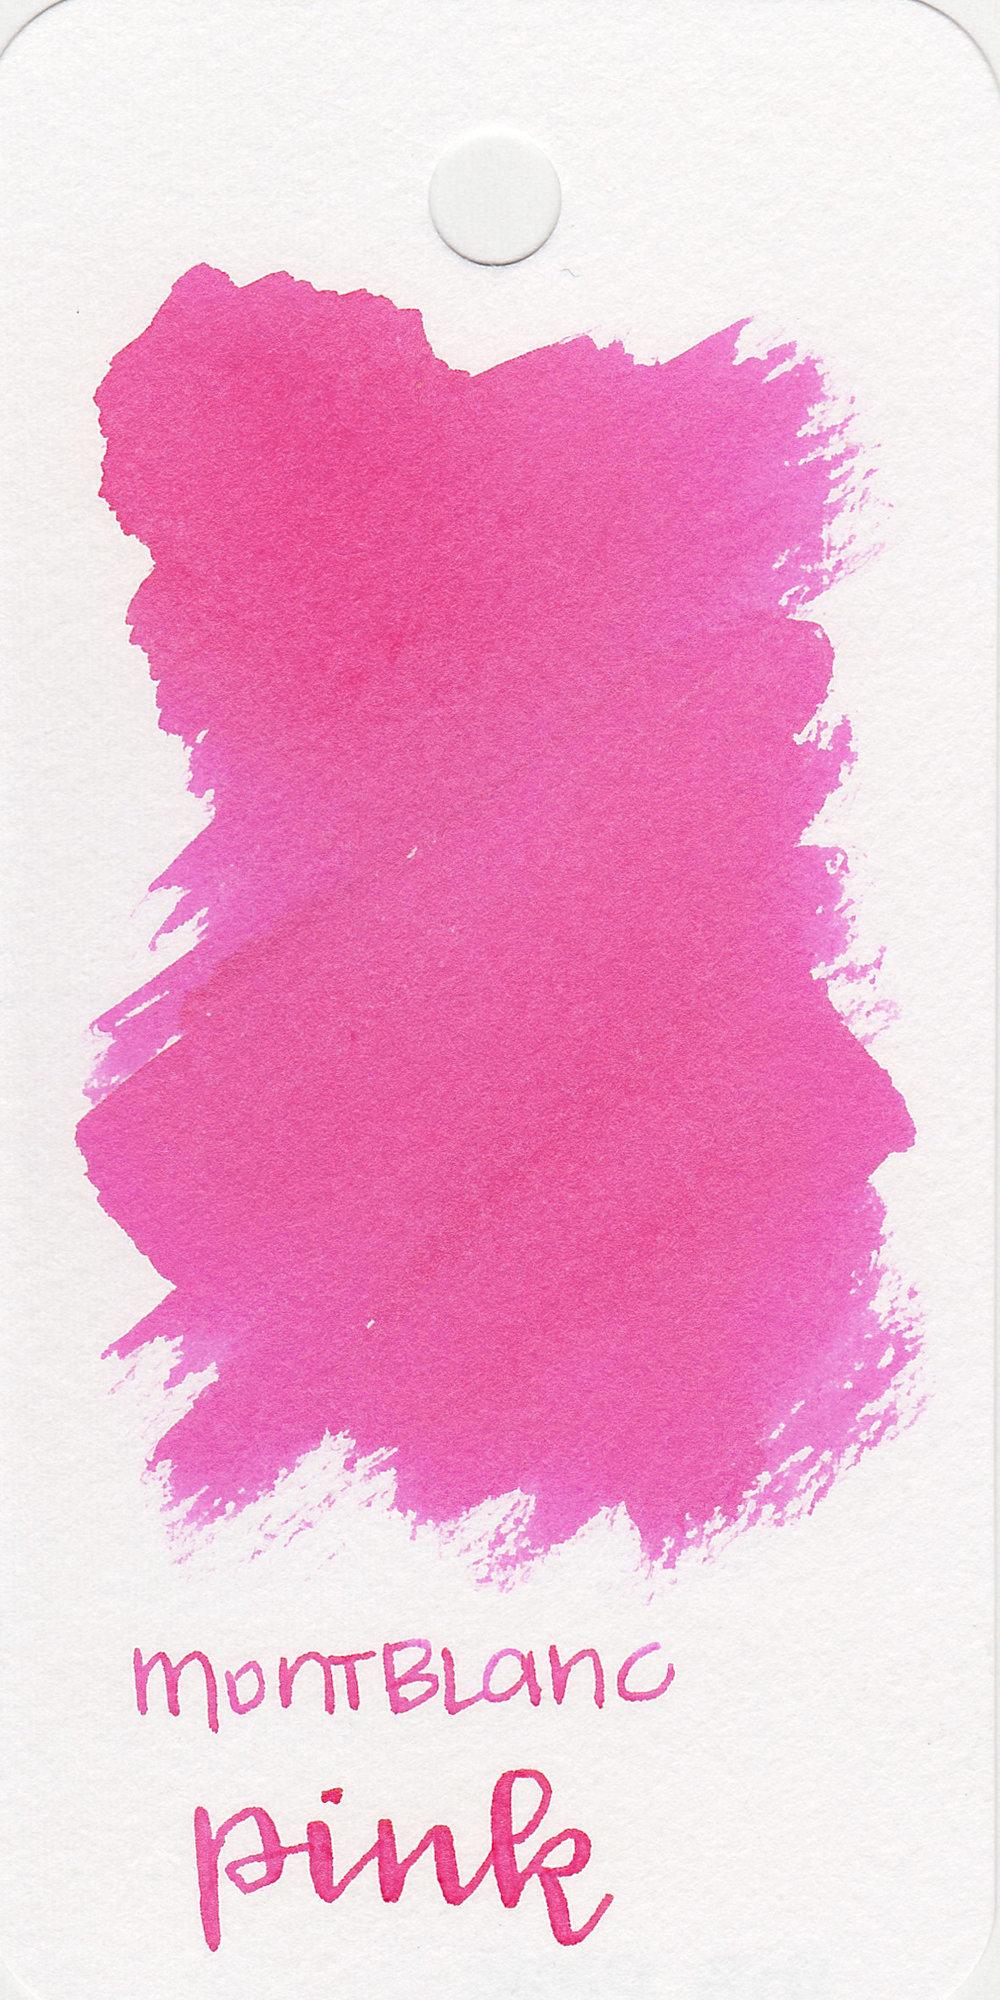 mb-pink-1.jpg